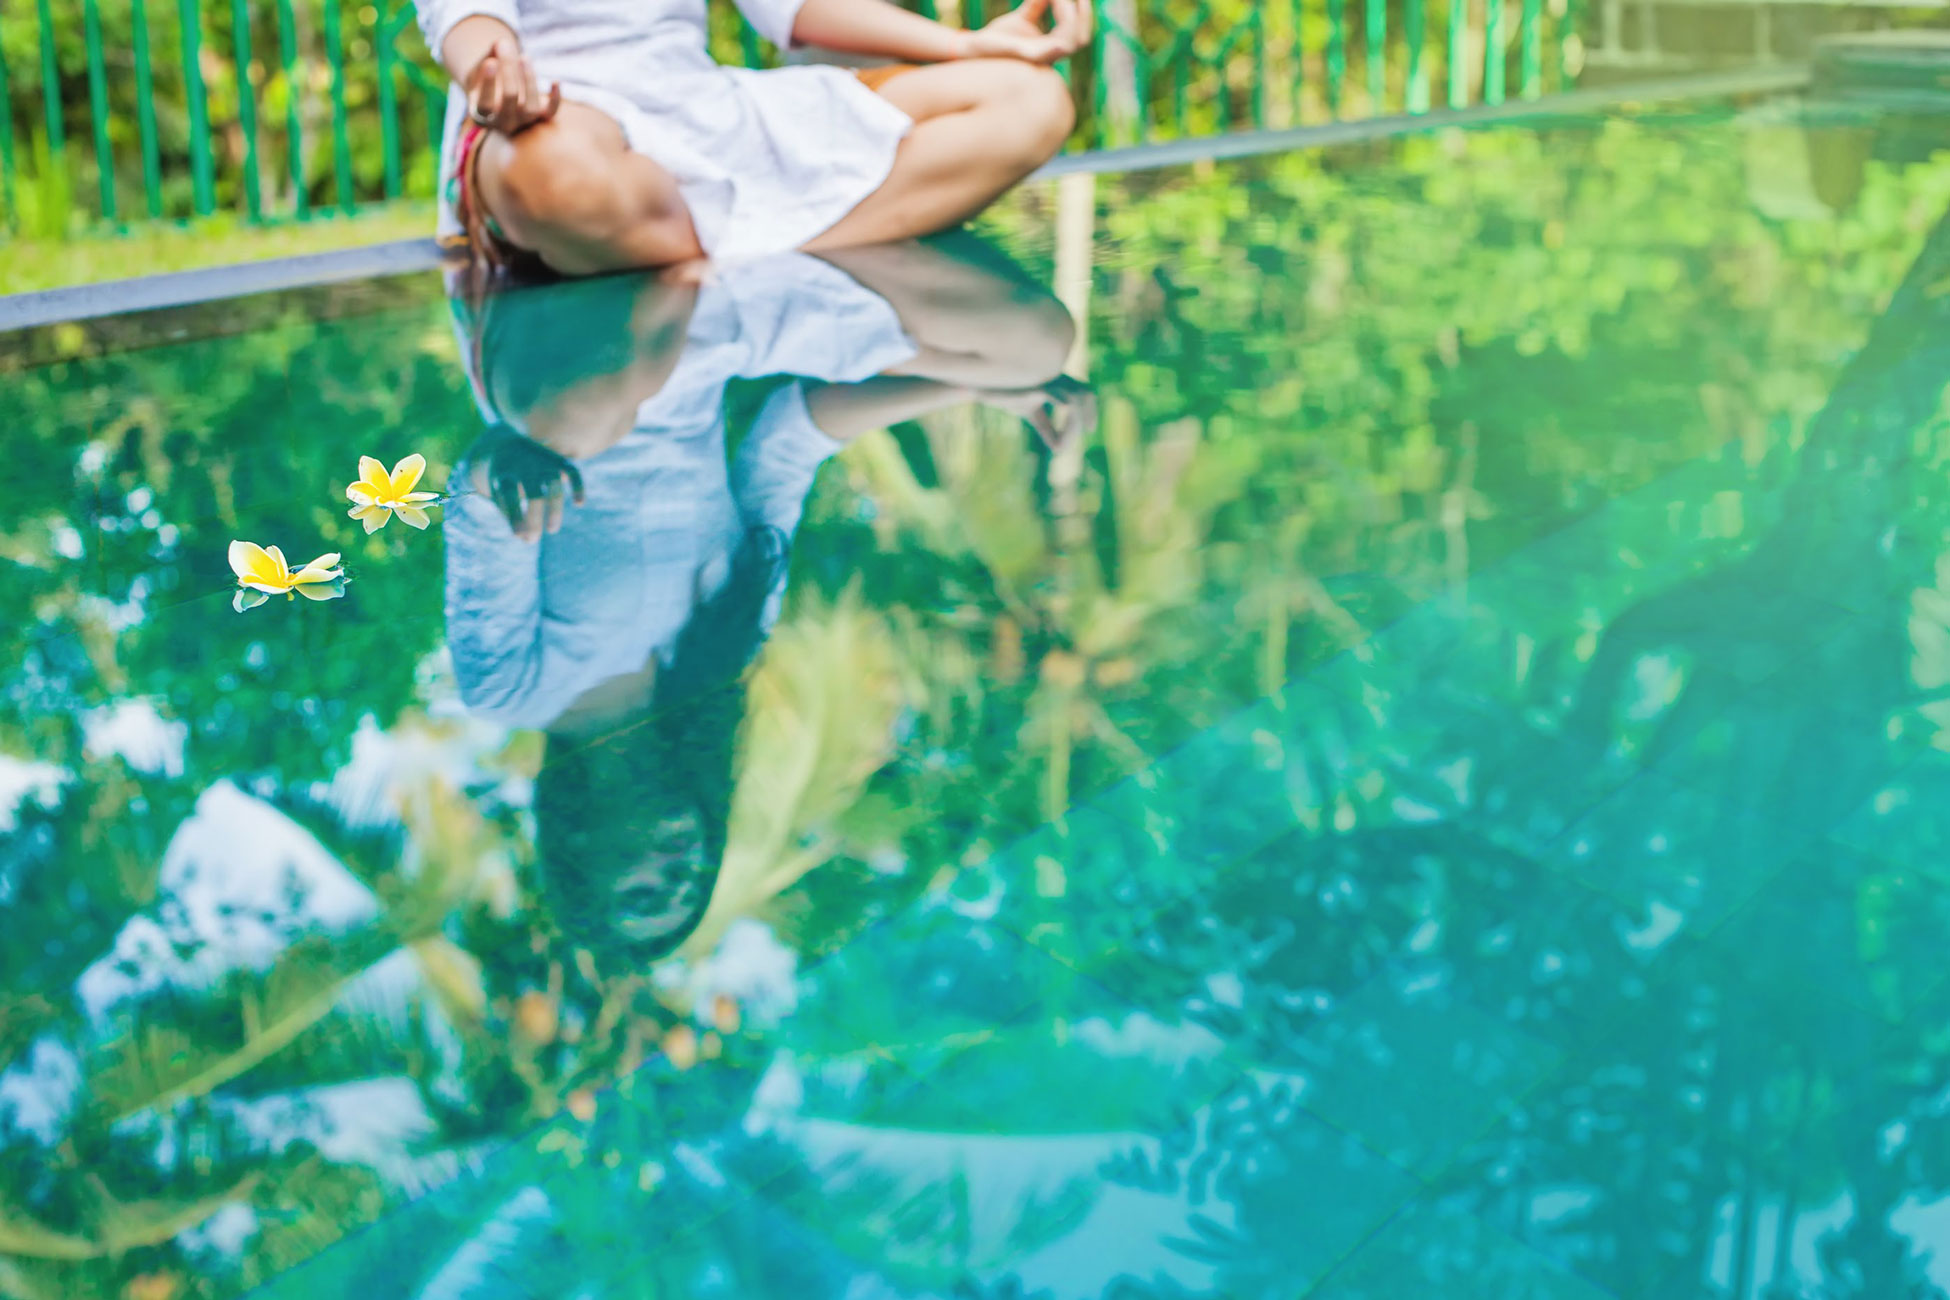 home-home-dia-internacional-del-yoga-viaje-al-interior